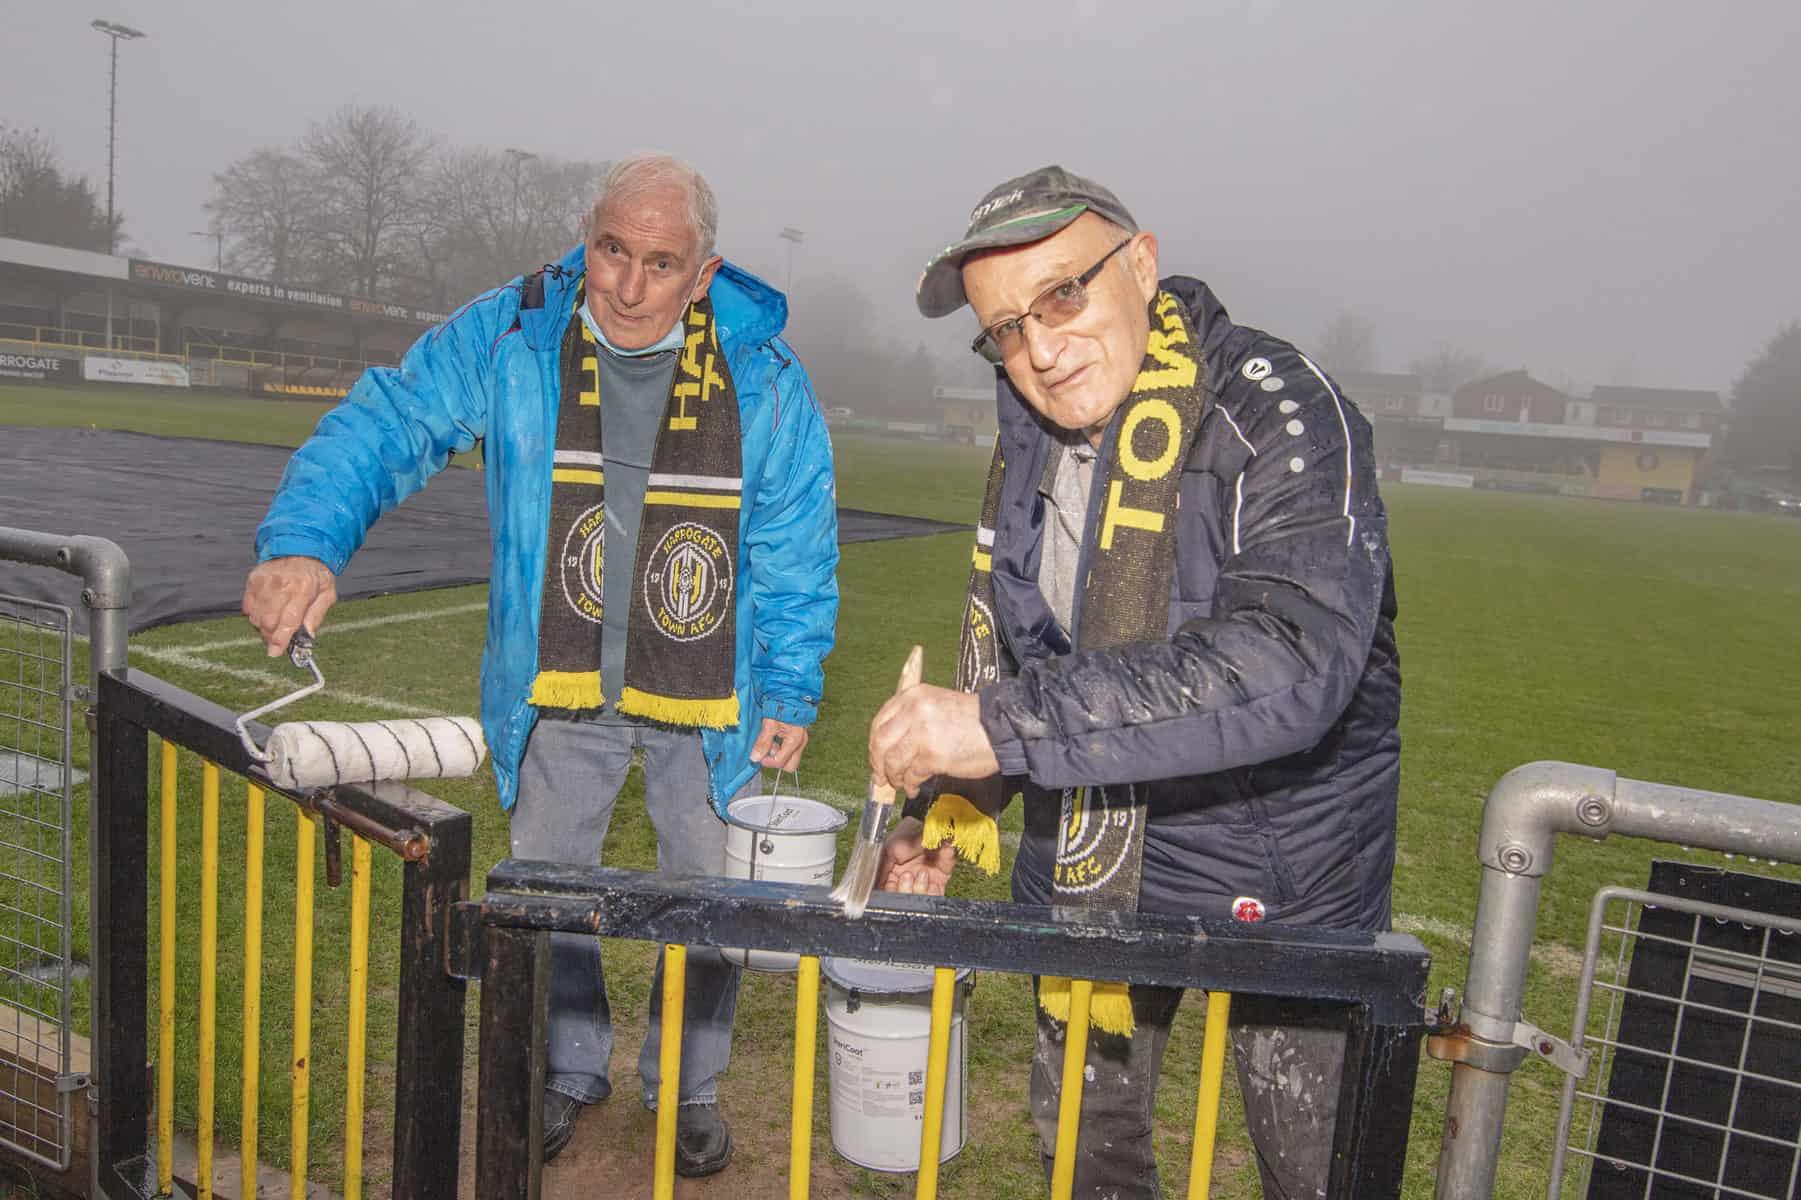 Harrogate Town Football Club